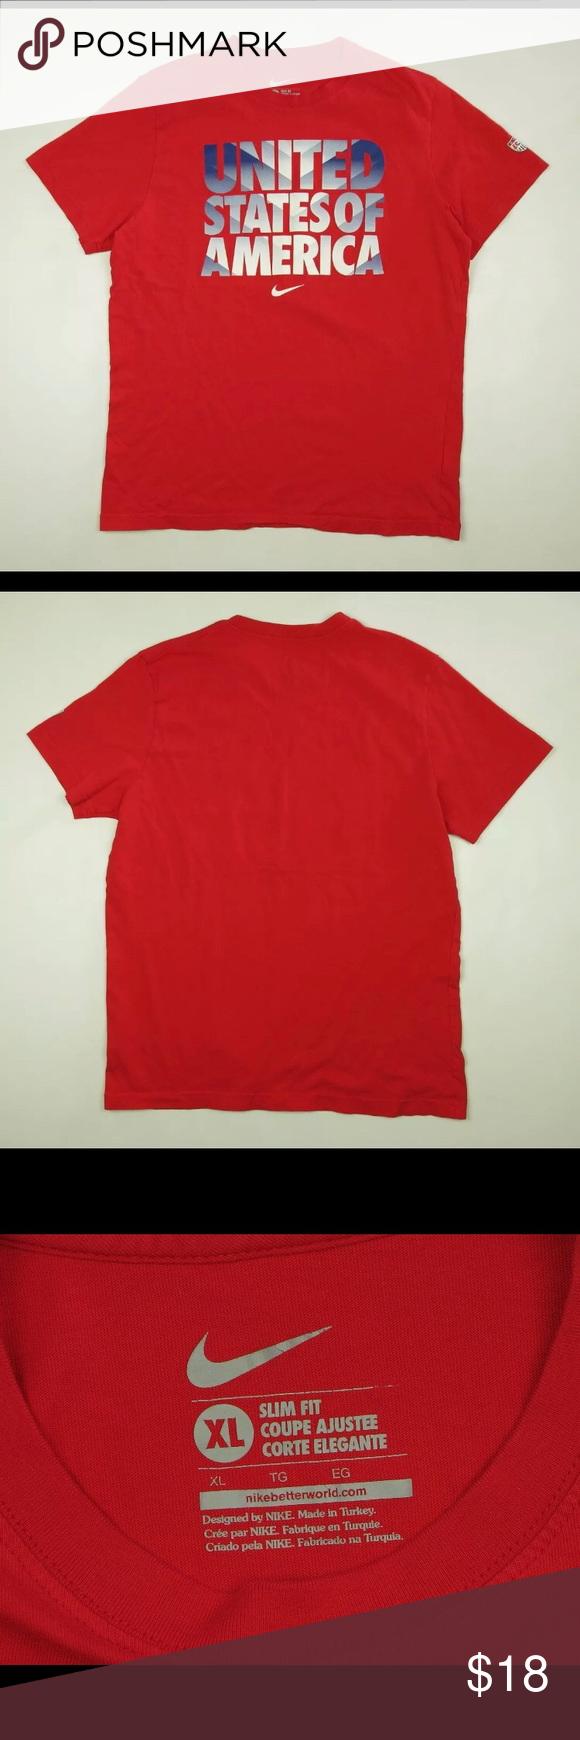 Nike United States Of America Red Xl T Shirt Shirts Tee Shirts T Shirt [ 1740 x 580 Pixel ]